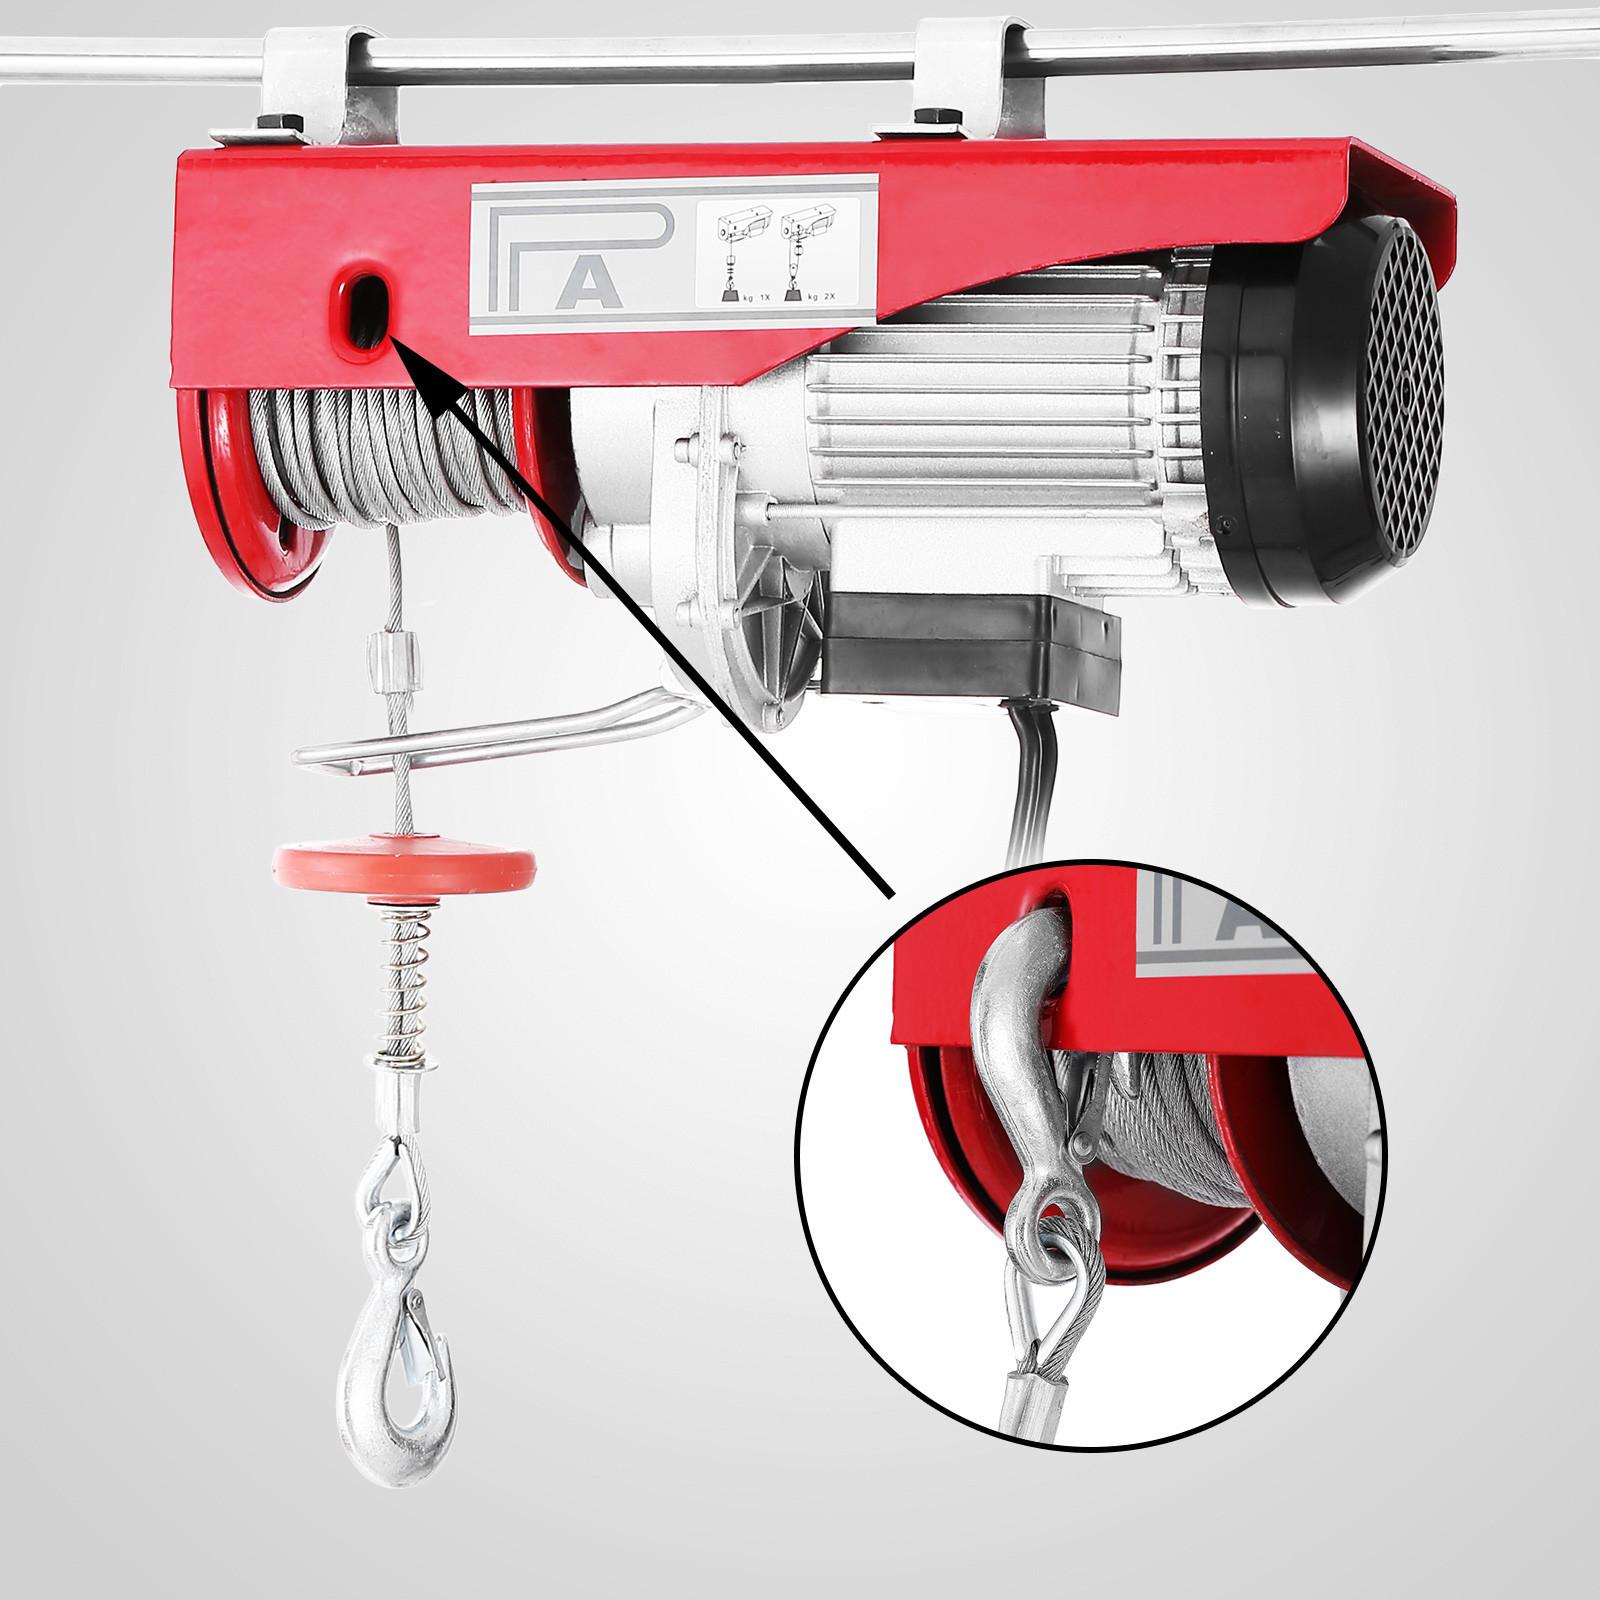 100kg-900kg-Electric-Hoist-Winch-Lifting-Engine-Crane-Cable-Lift-Hook-Garage miniature 60